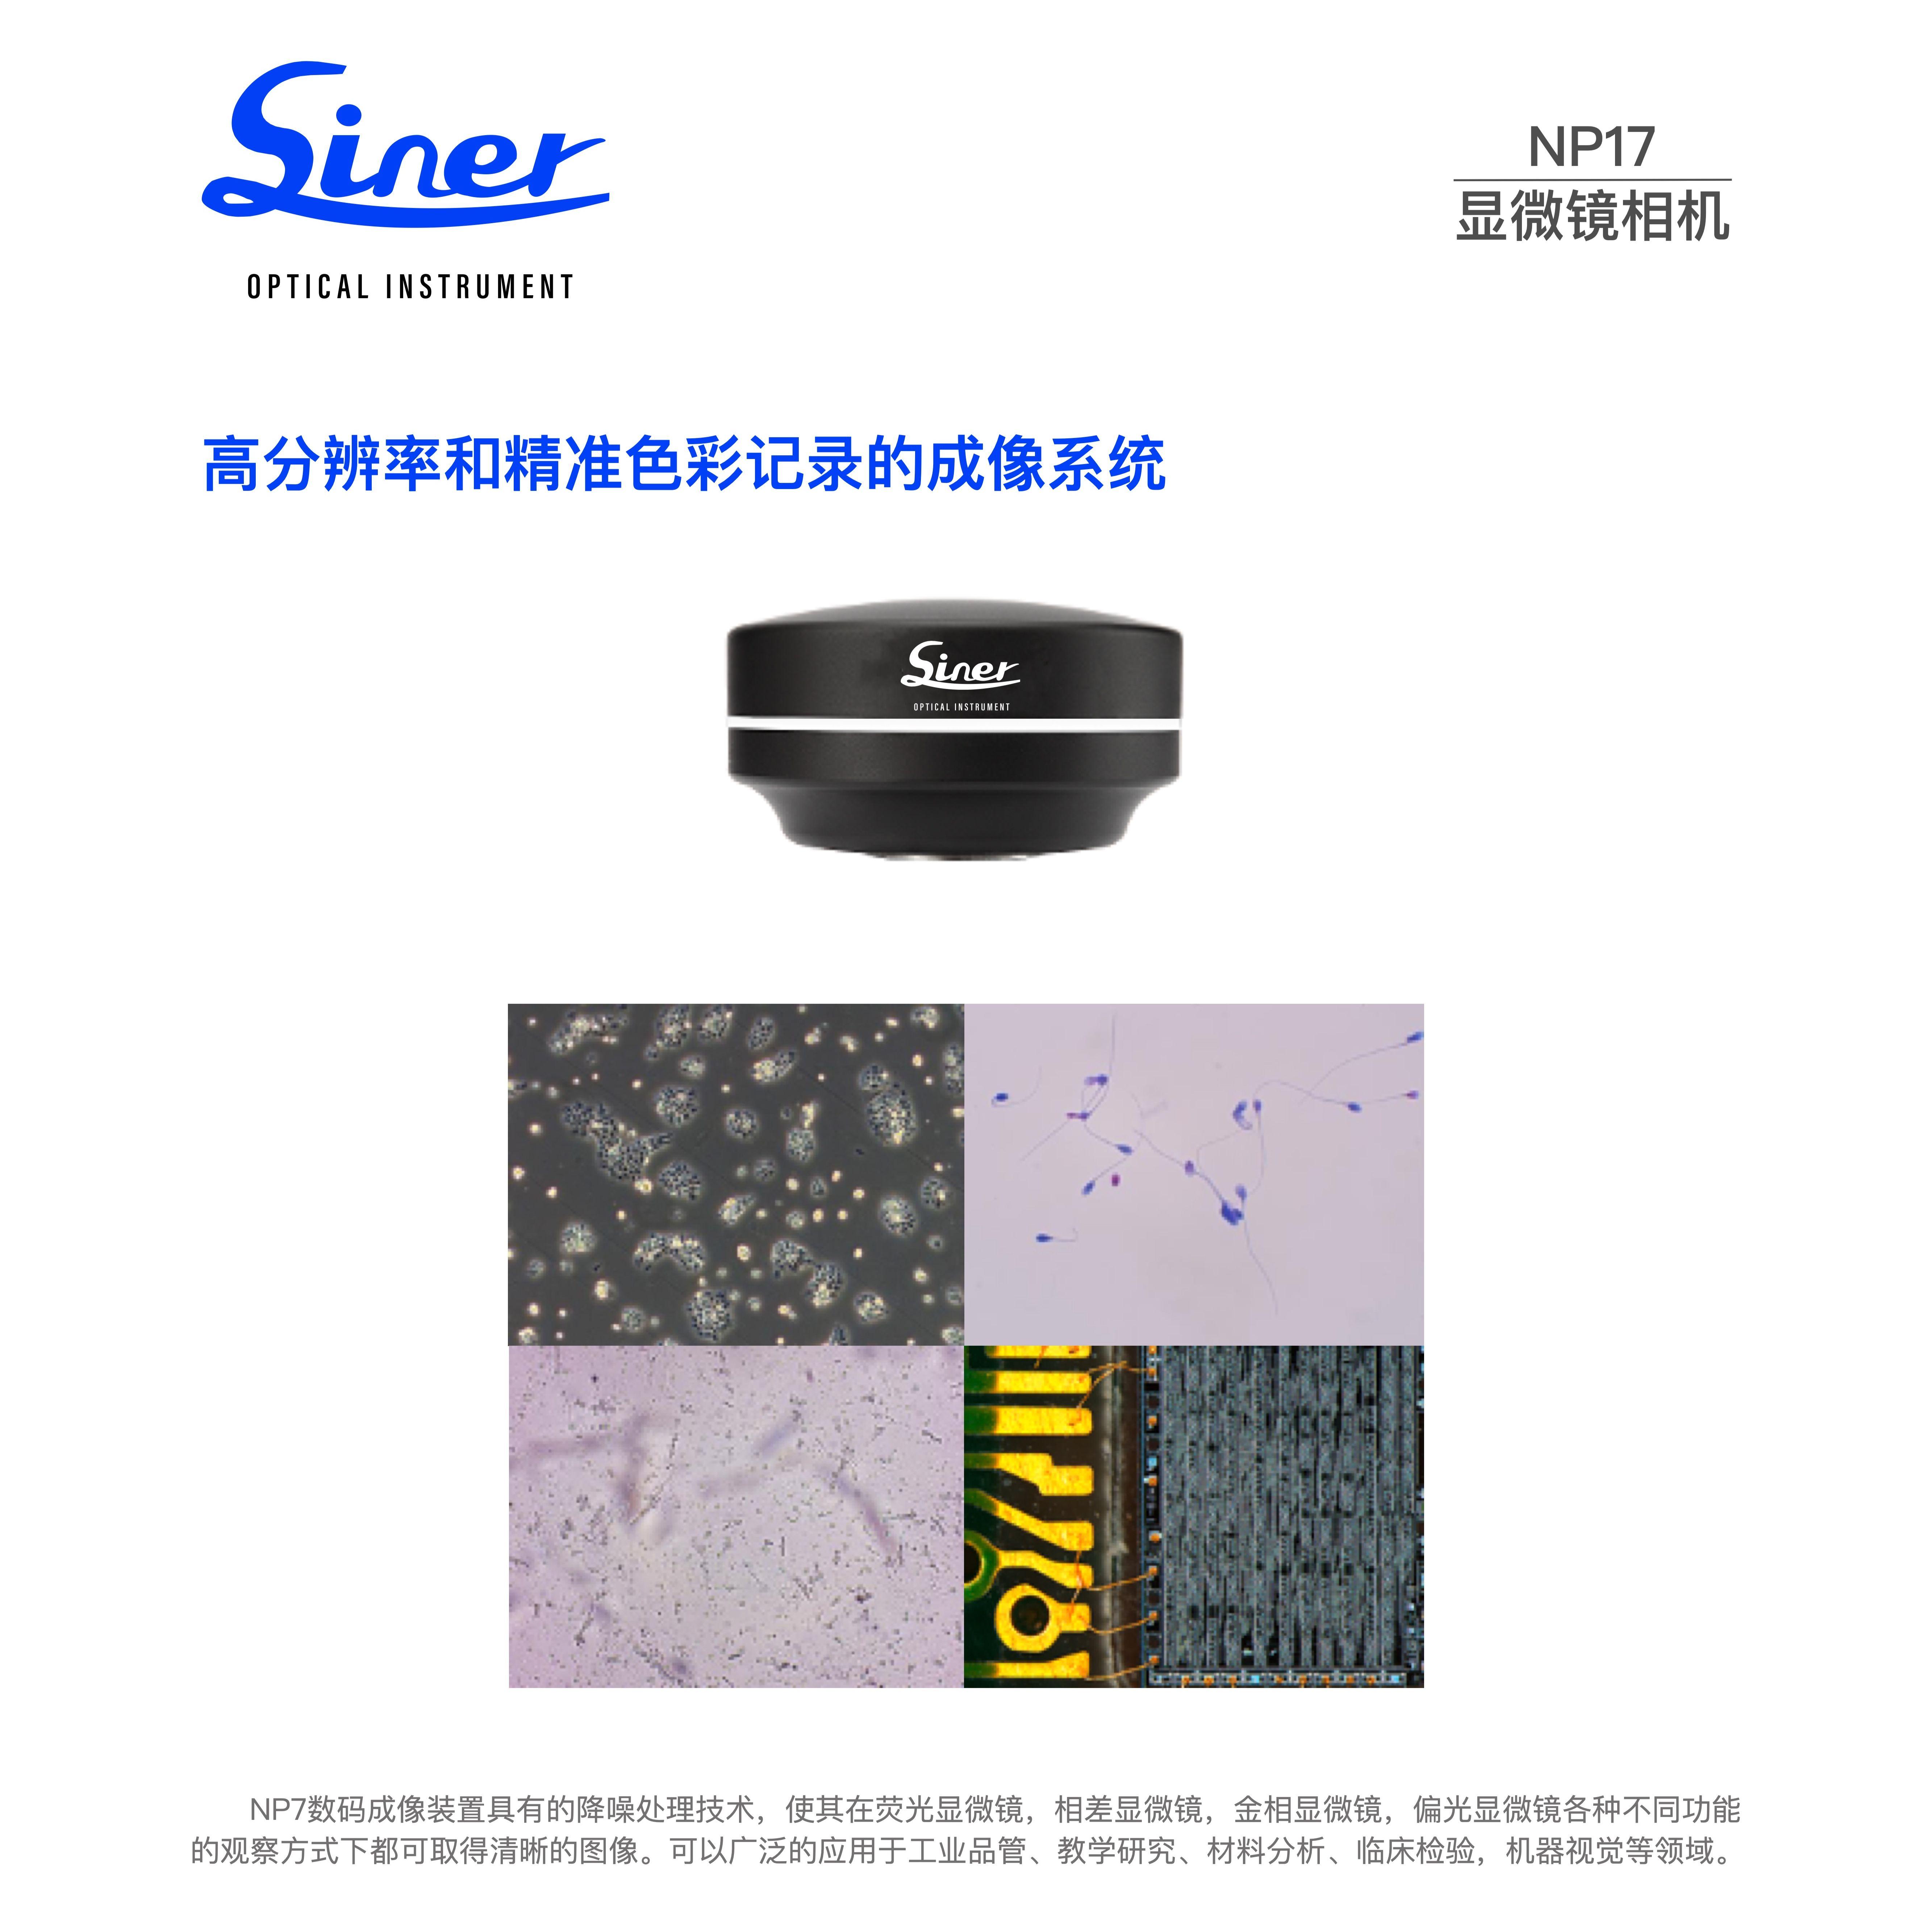 Siner 显微镜相机 NP17